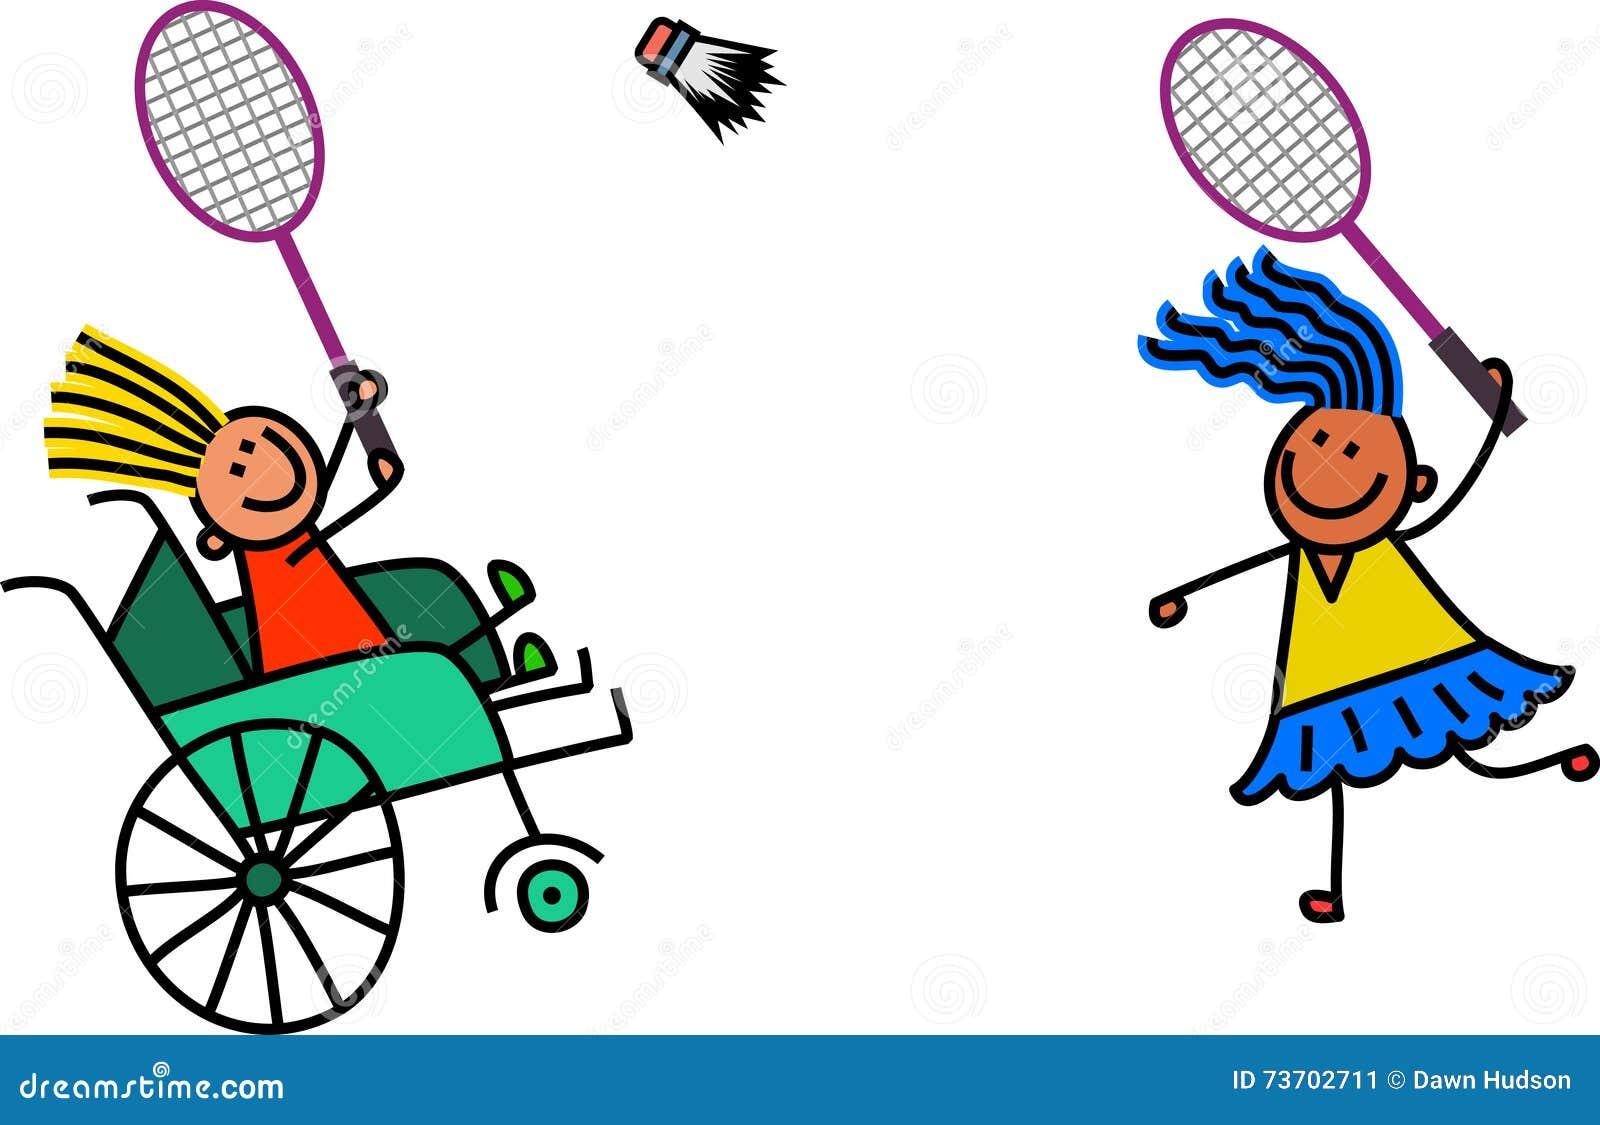 badminton games for girls